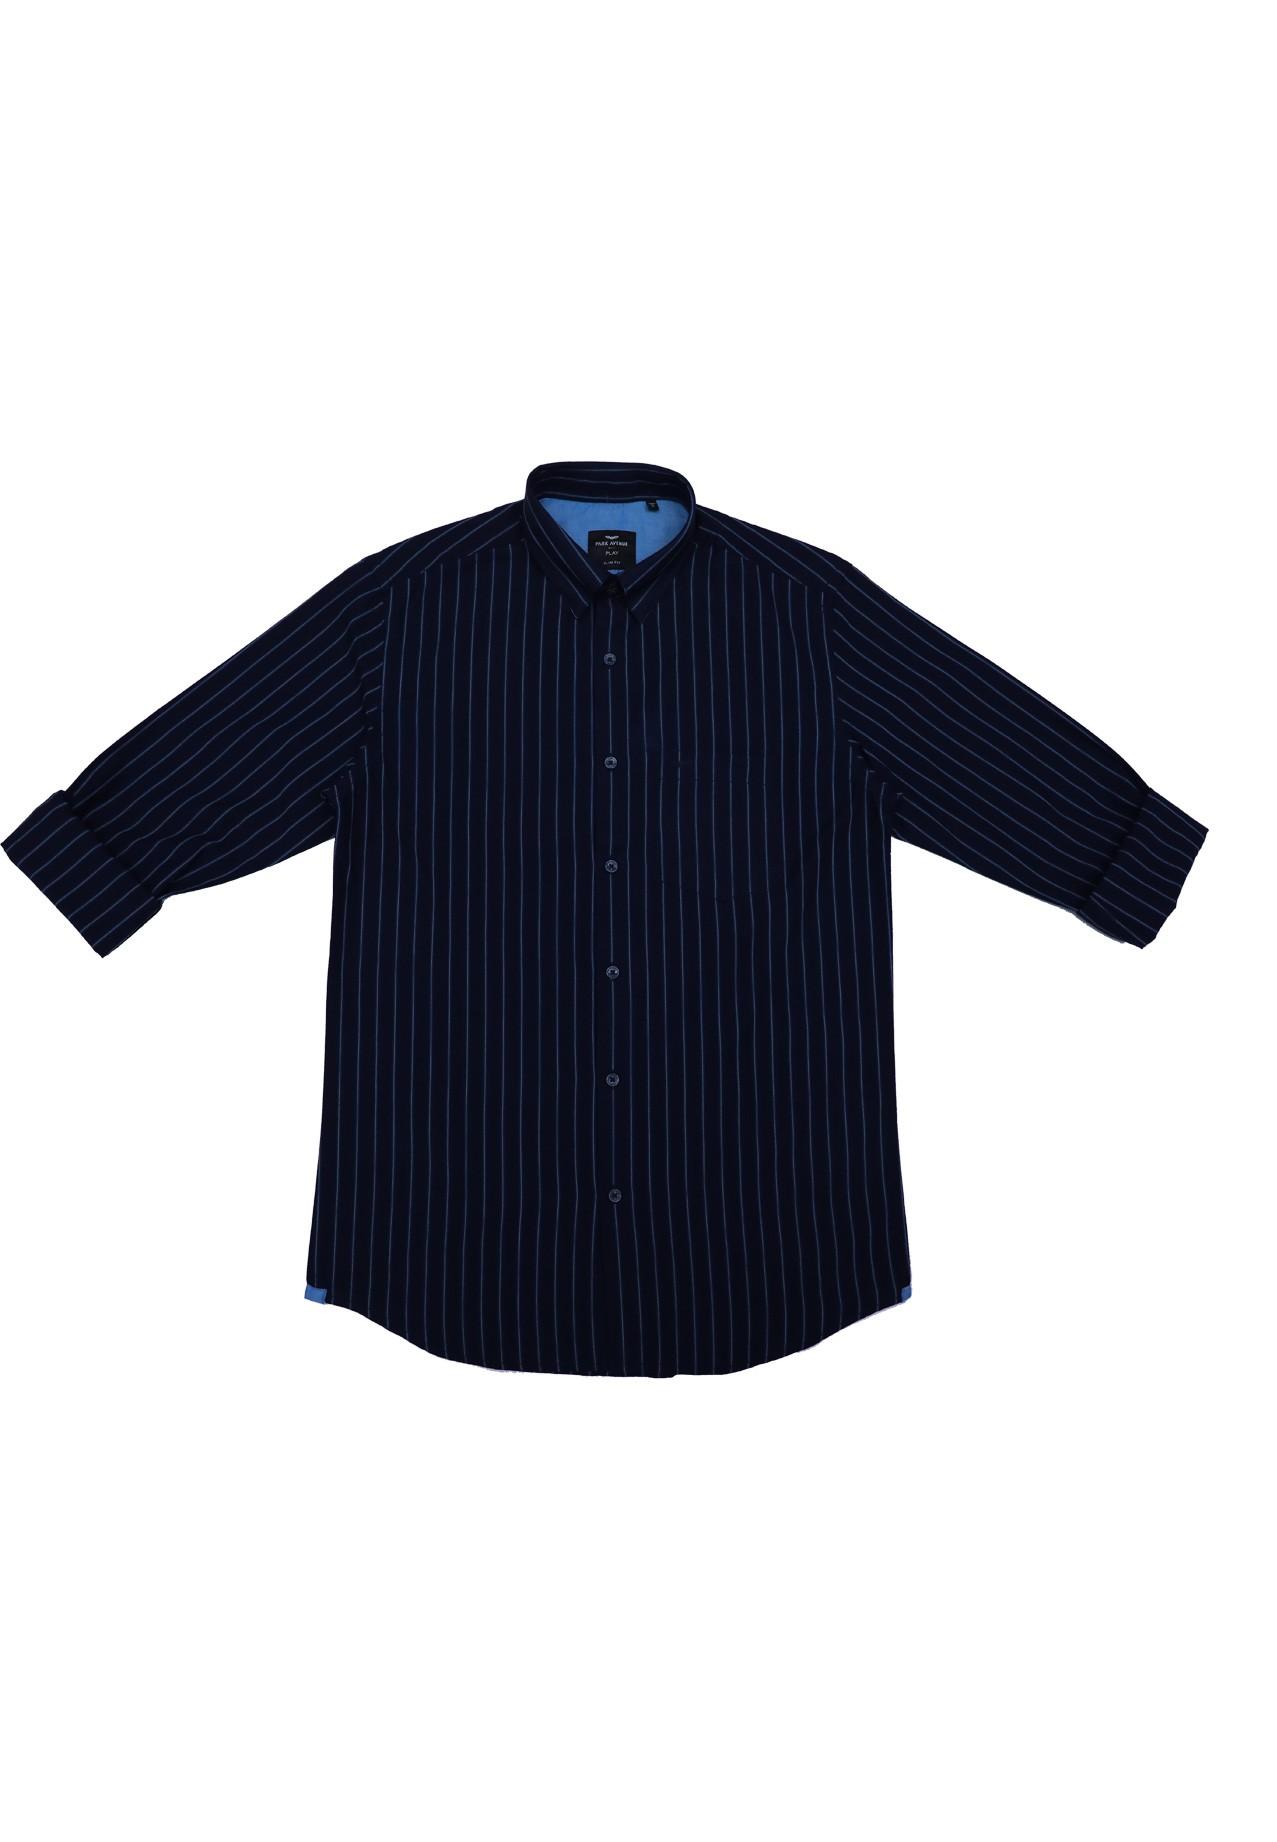 Park Avenue PCSA01884-B7 Mens Shirt